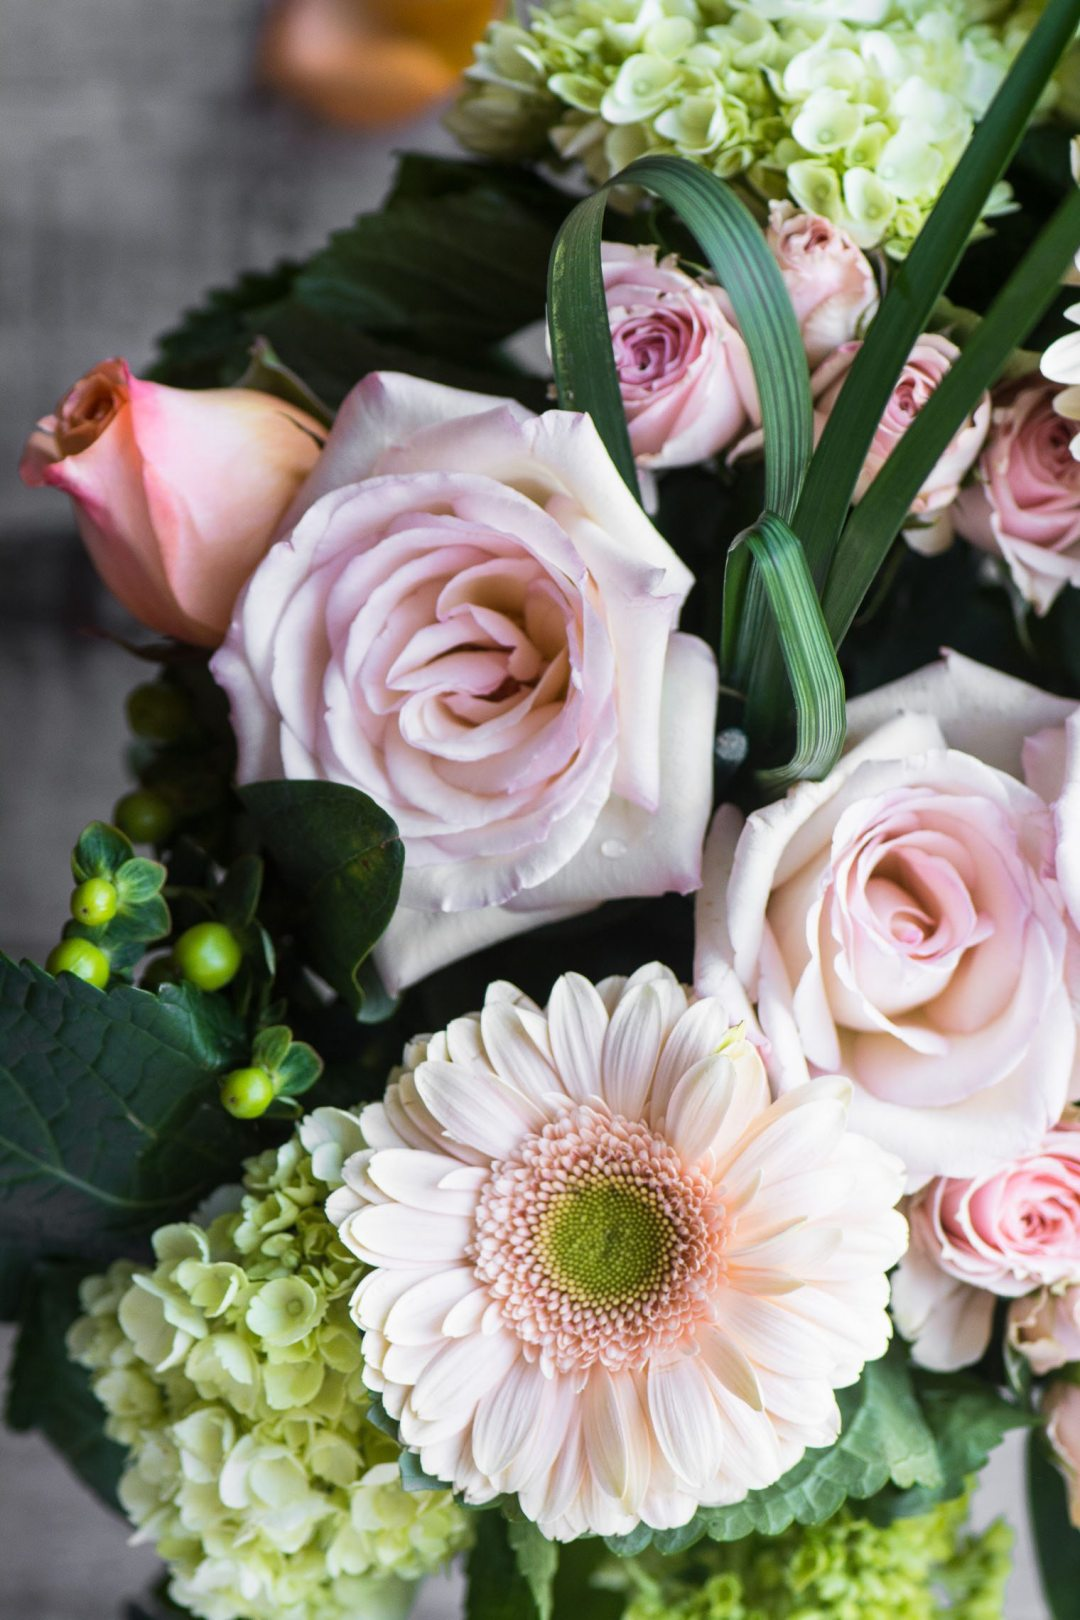 beautiful fresh cut flowers